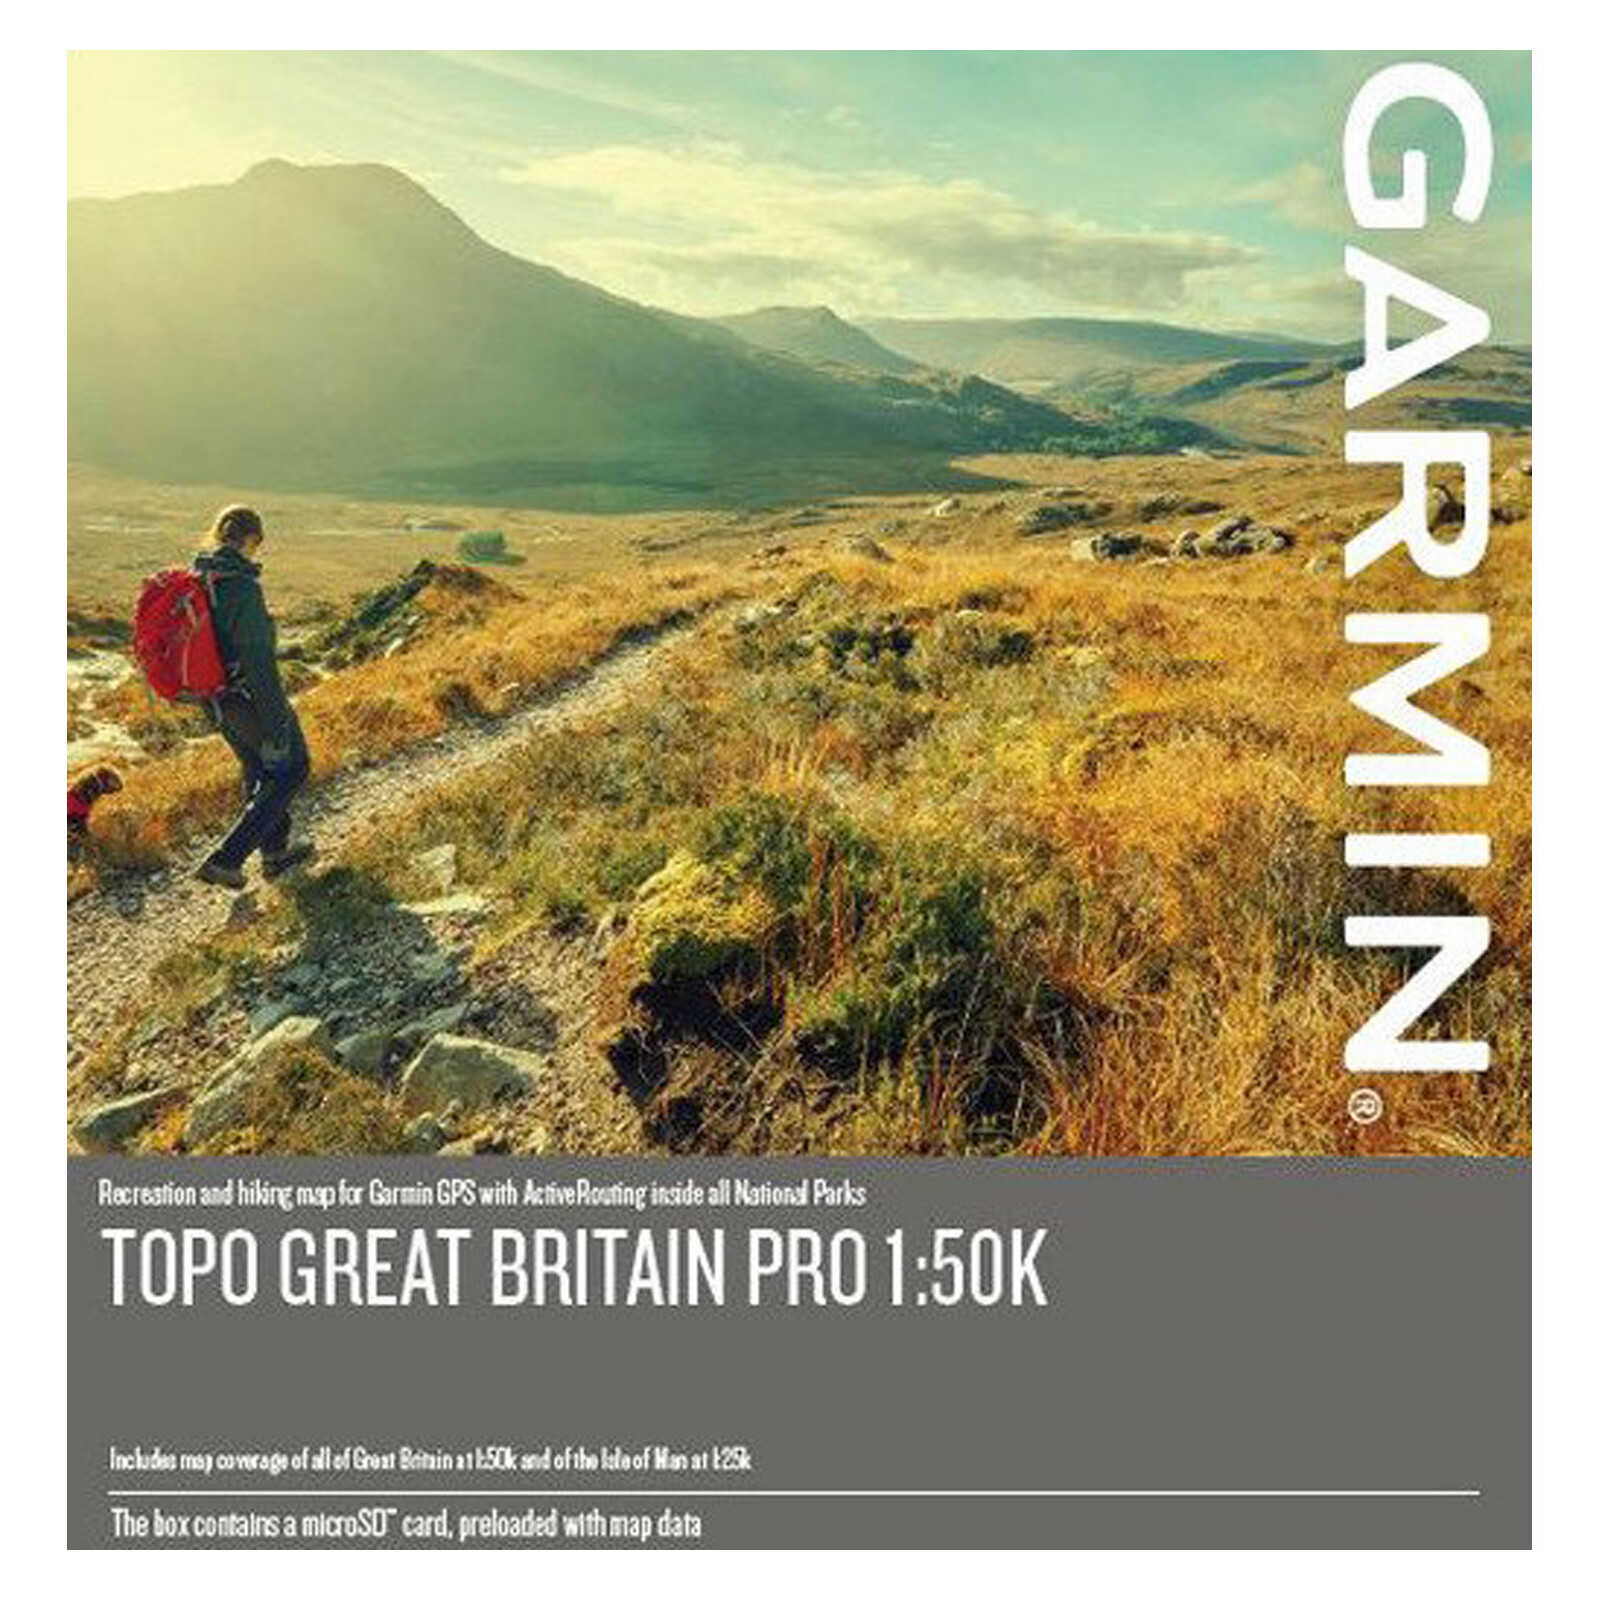 Garmin Topo PRO Great Britain 1:50k mSD/SD